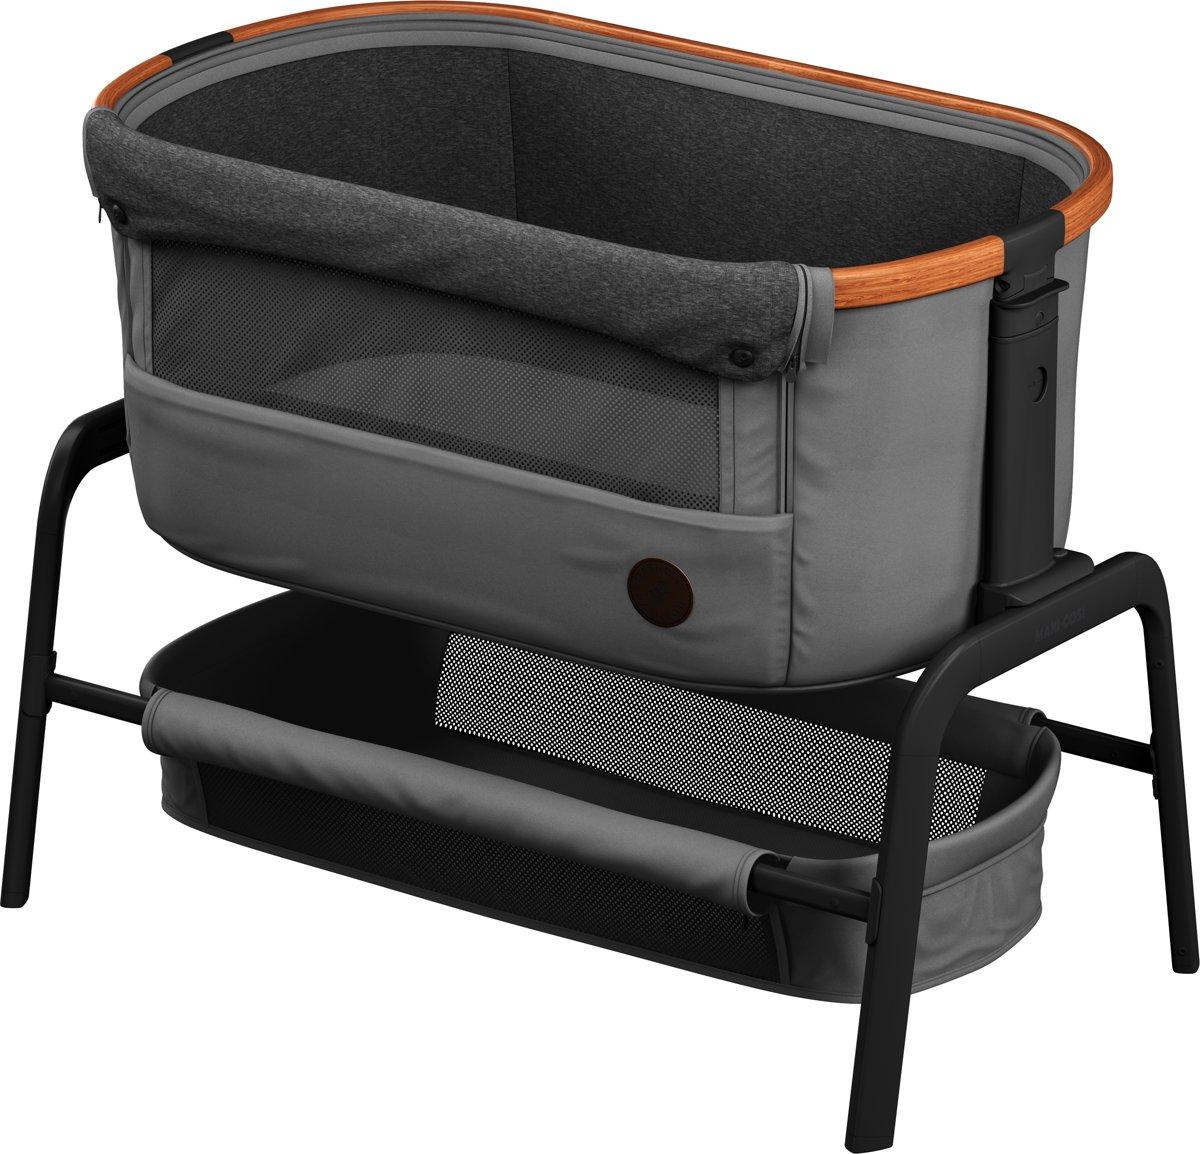 Maxi-Cosi Iora Co-sleeper - Essential Grey